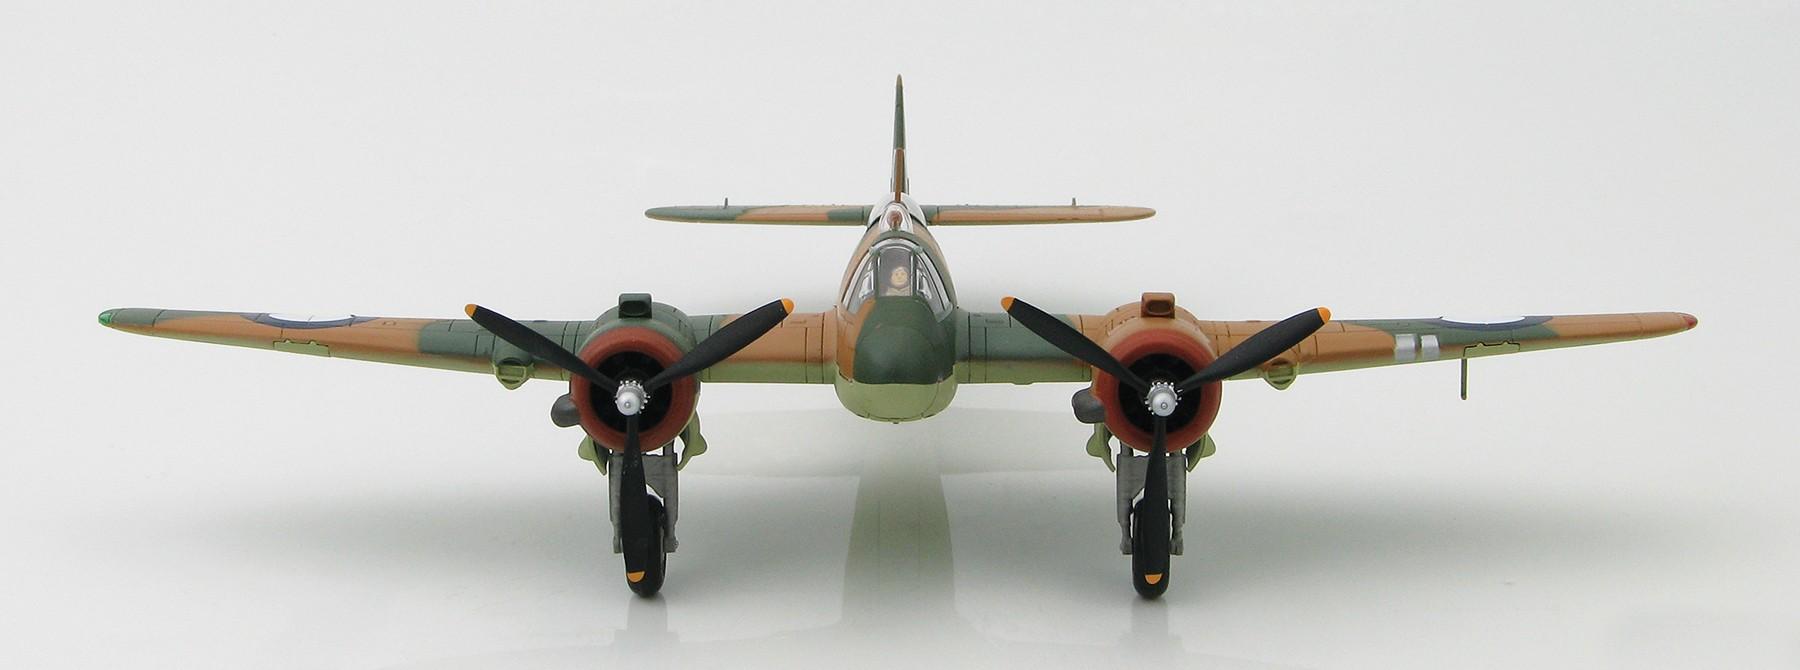 Port Hobby Master 1:72 HA2314 Bristol Beaufighter Mk IF A19-5 RAAF No.30 Sqn